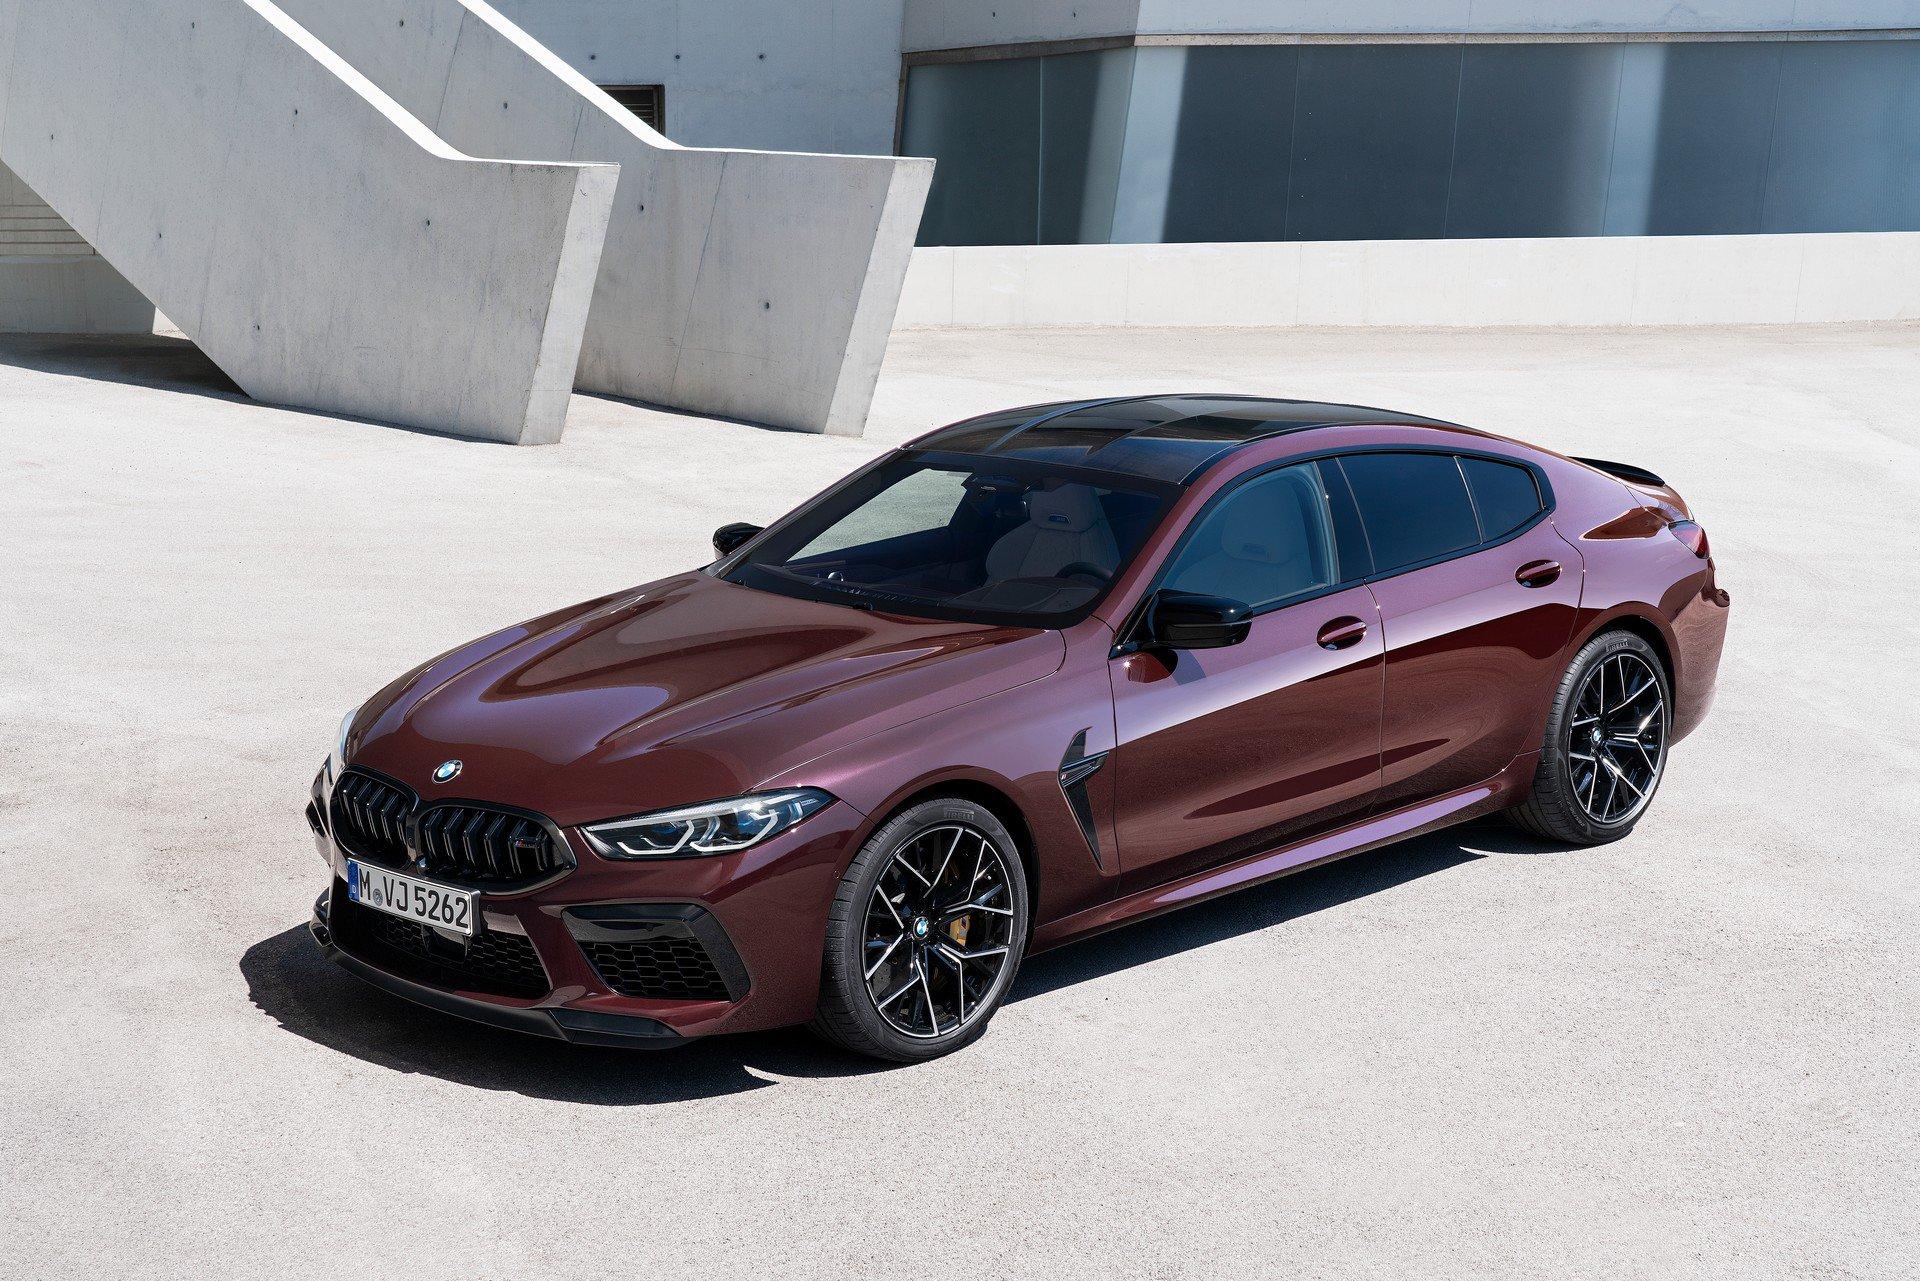 2020-bmw-m8-gran-coupe-5.jpg